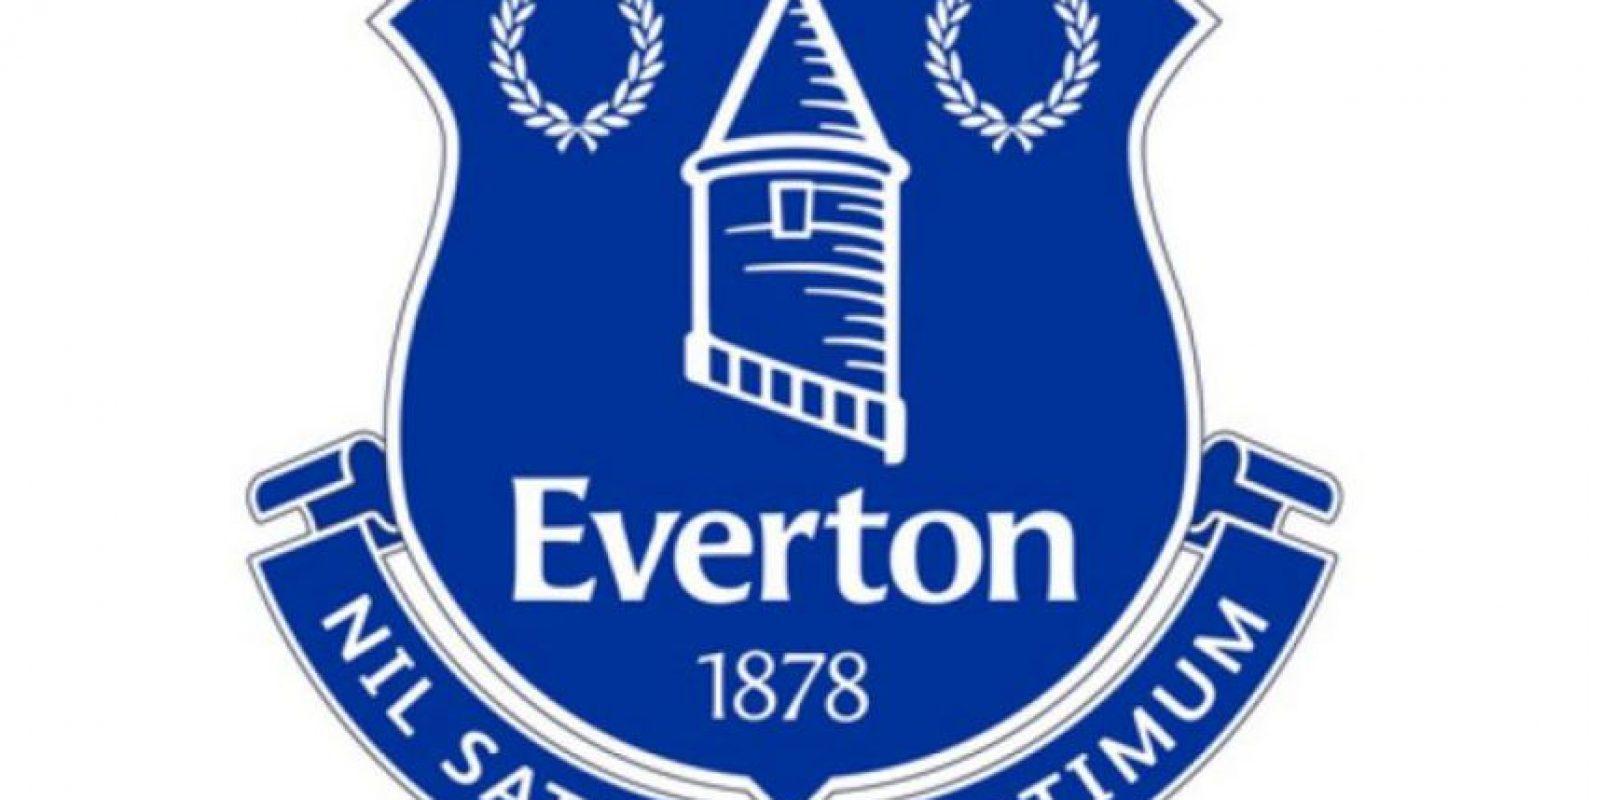 Foto:Everton inglés